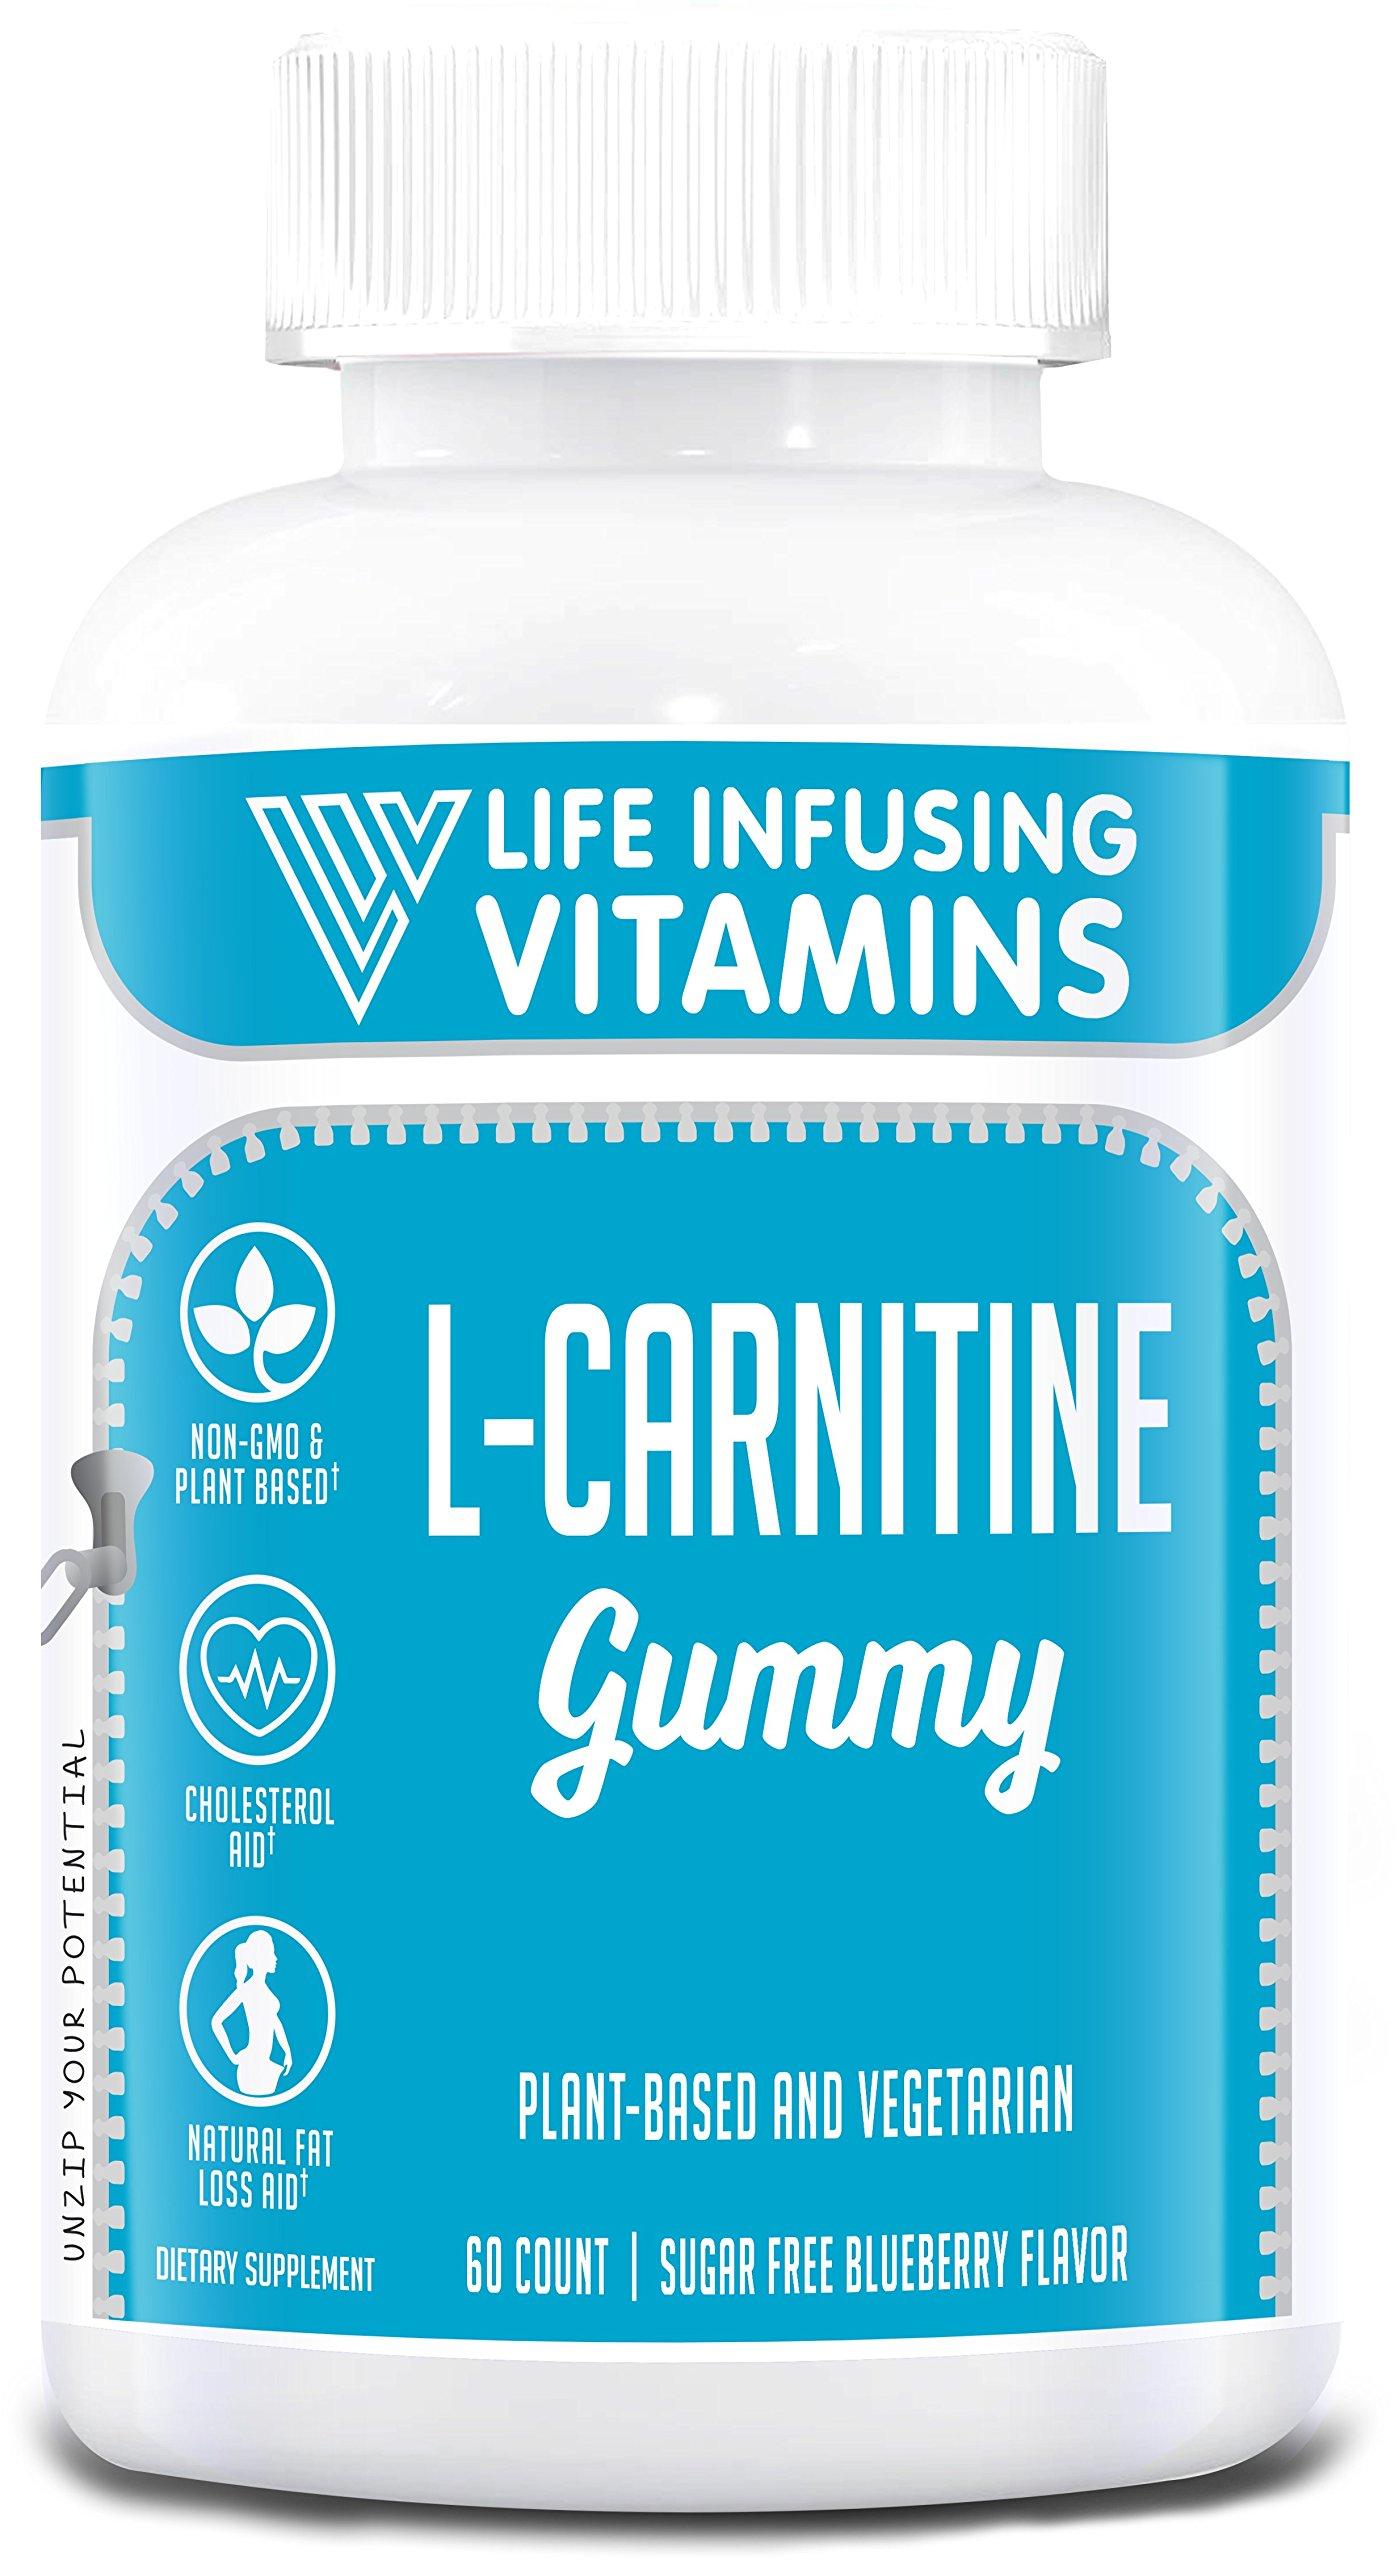 L-Carnitine Gummy, Extra Strength, 500mg, Plant Based, Vegetarian, Halal, Kosher, Sugar Free Blueberry Flavor